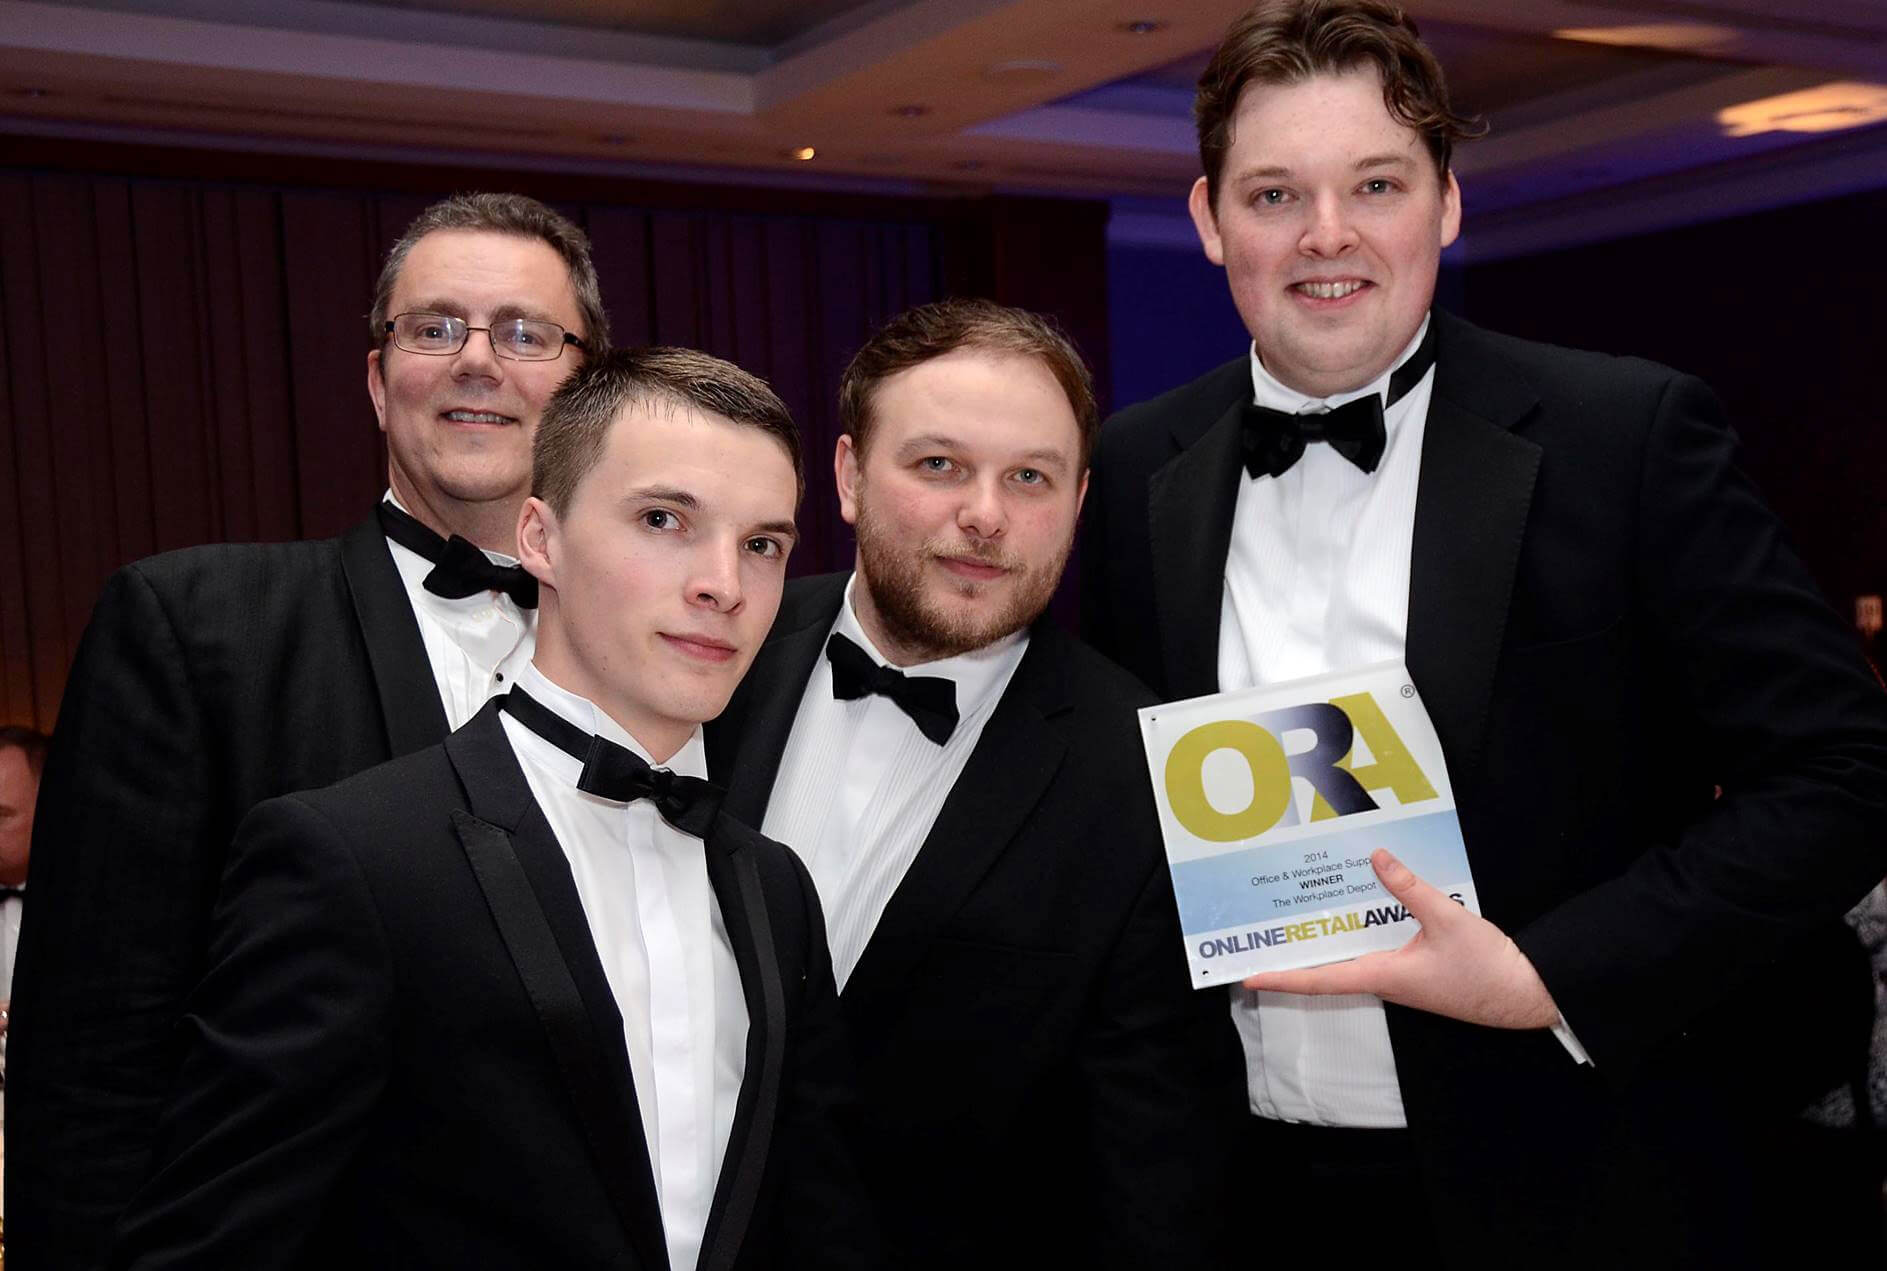 Online Retail Awards 2014 Winners